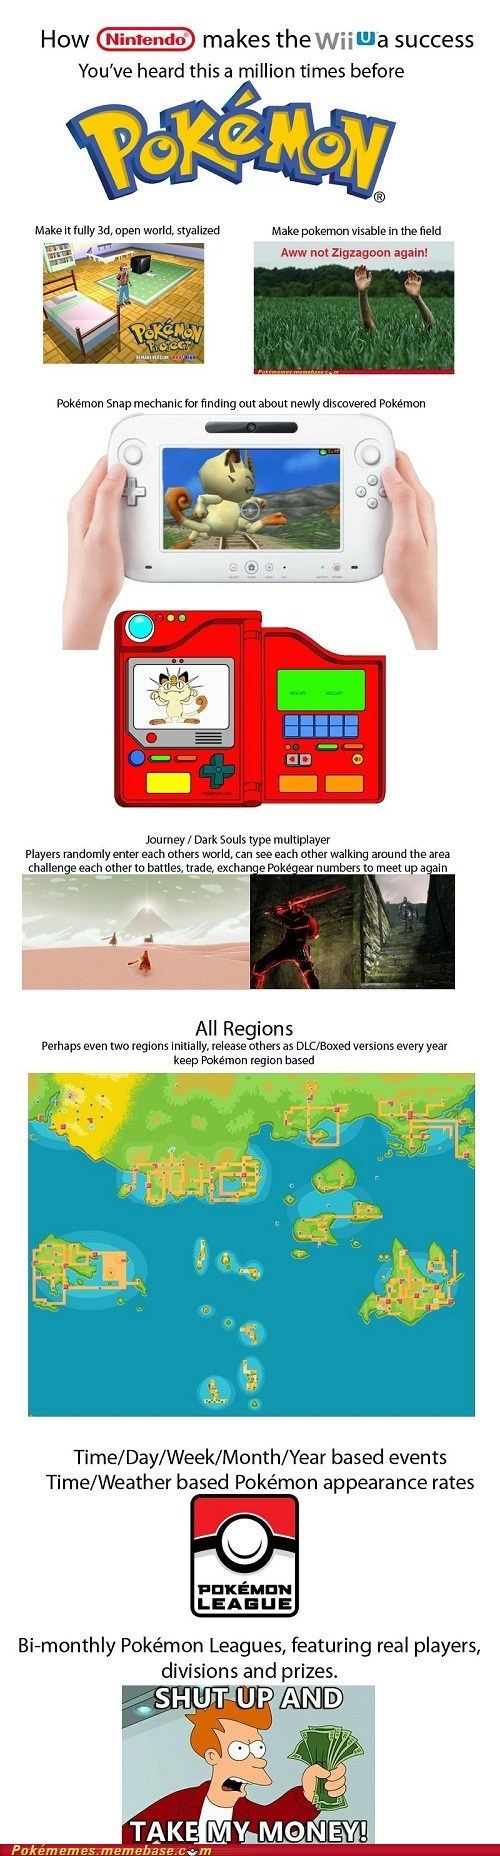 gamefreak nintendo Pokémon the internets video games wii U - 6335858944